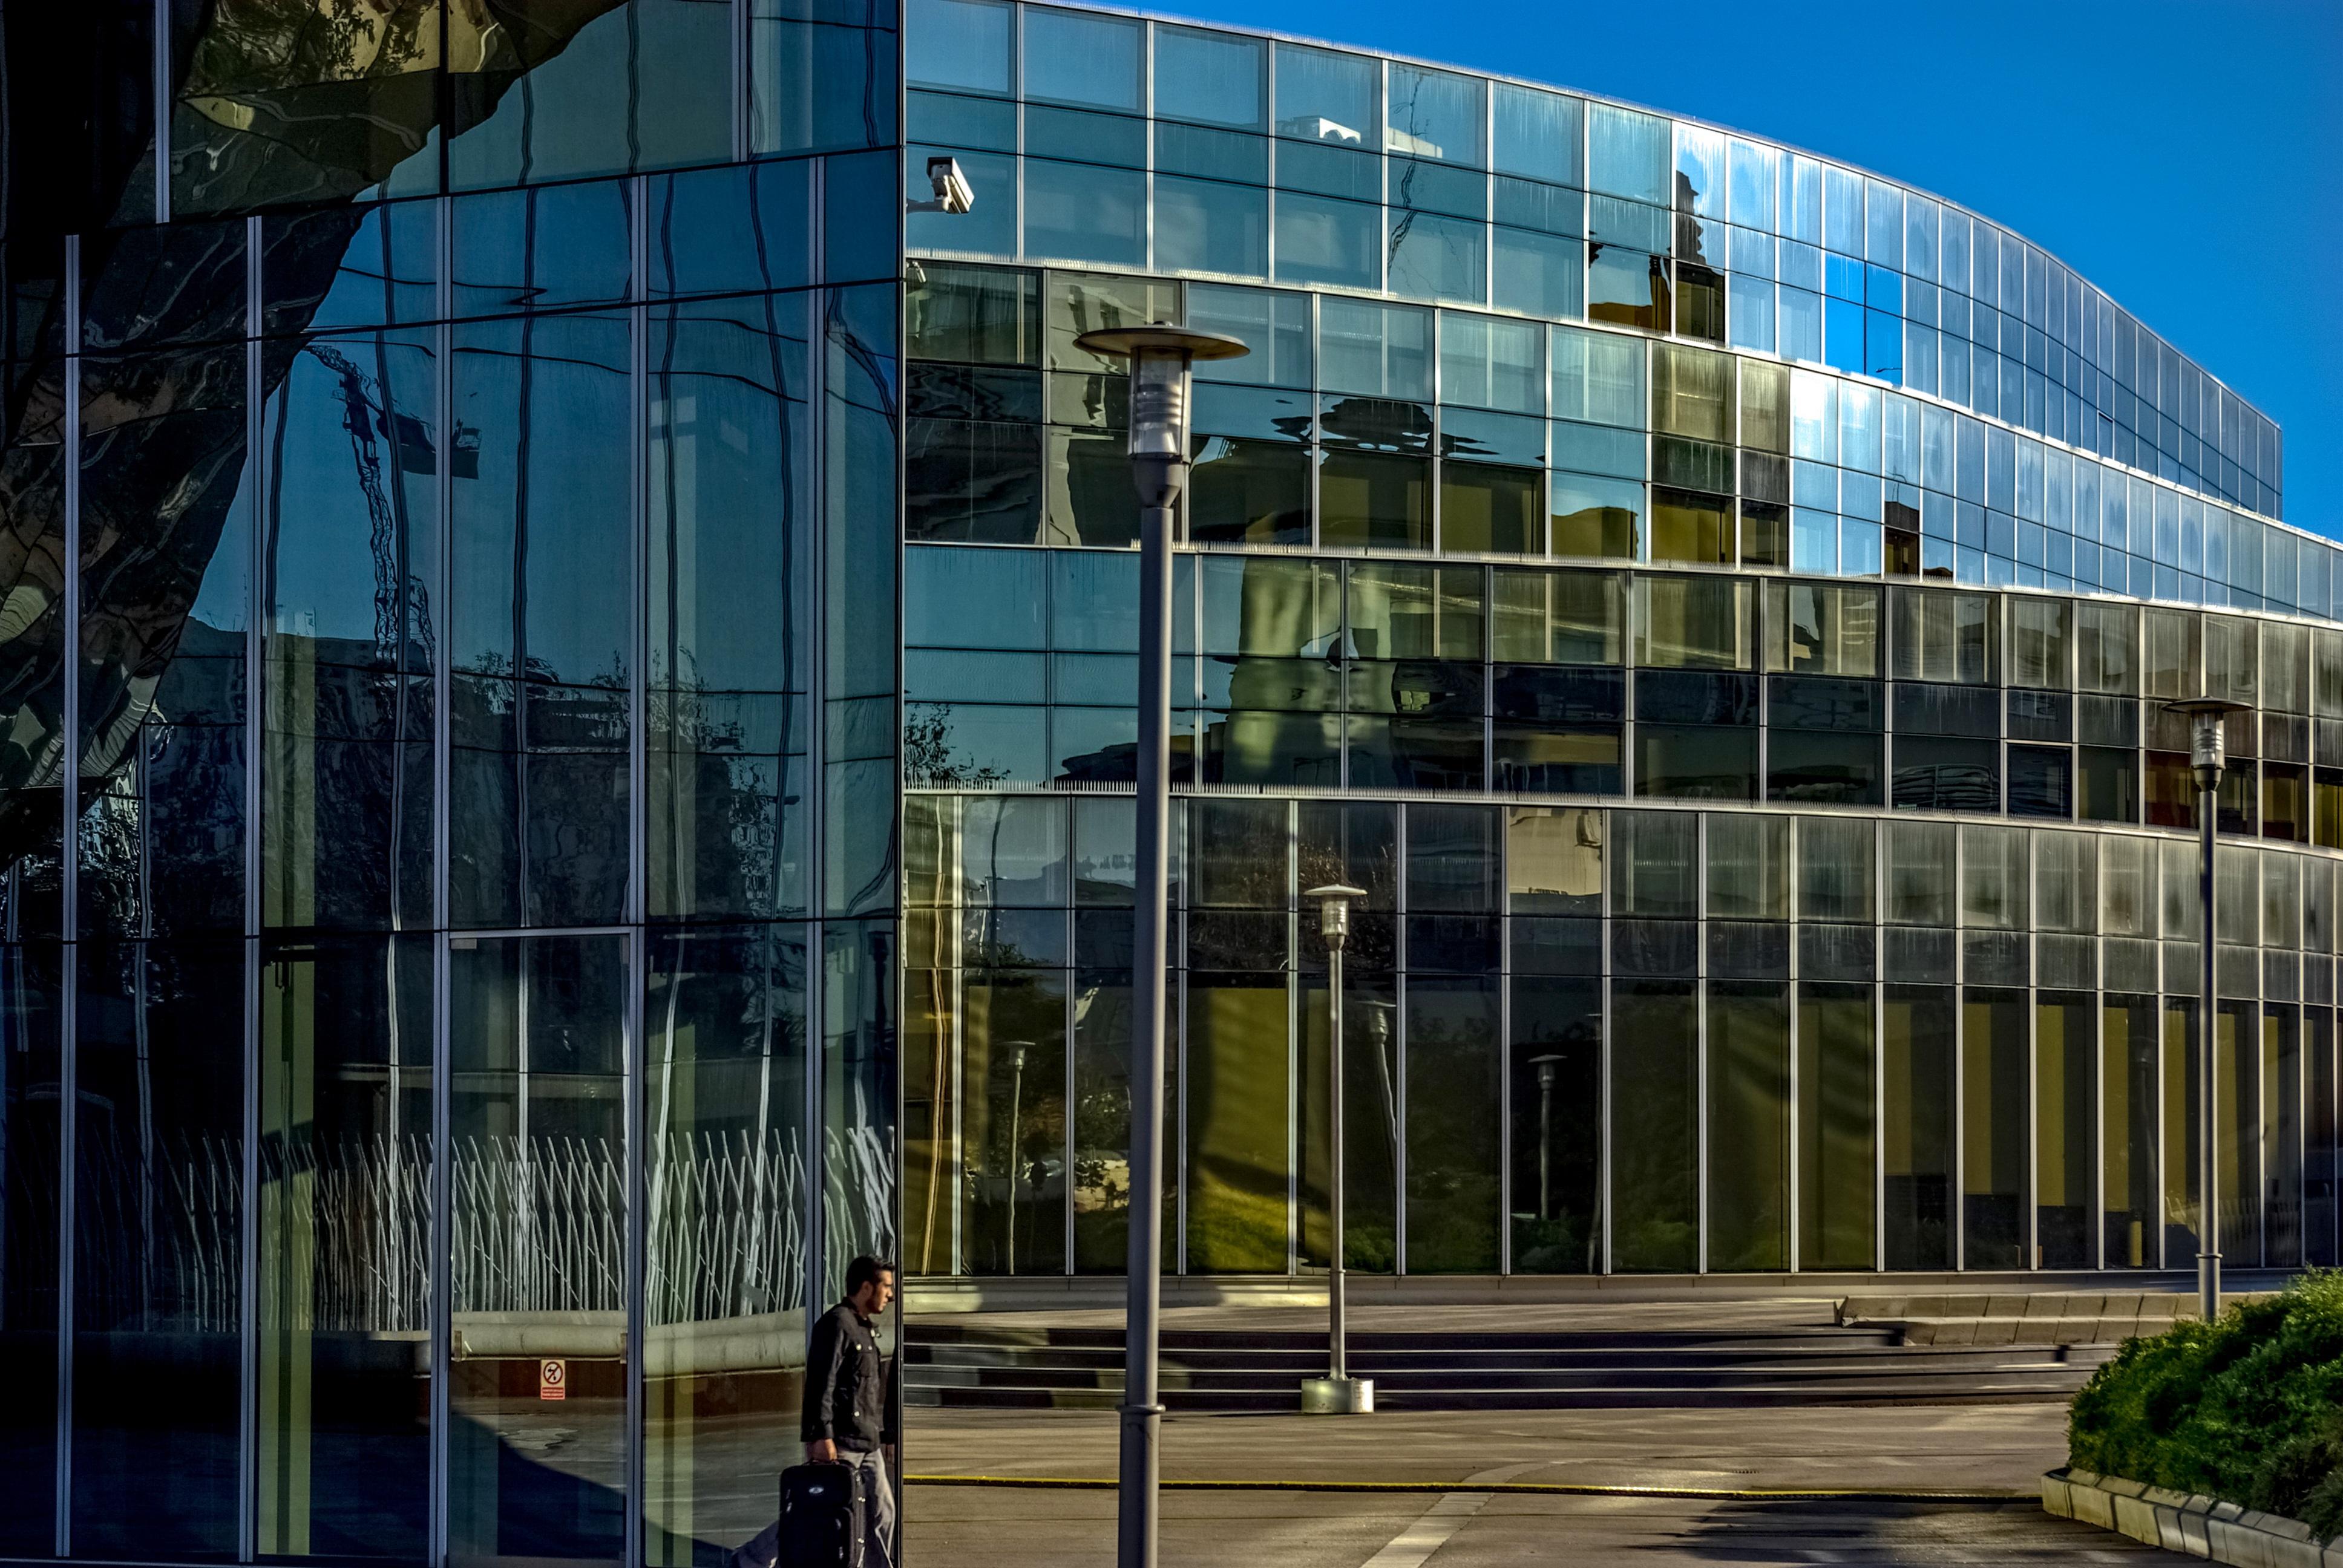 Фасады зданий фото из стекла